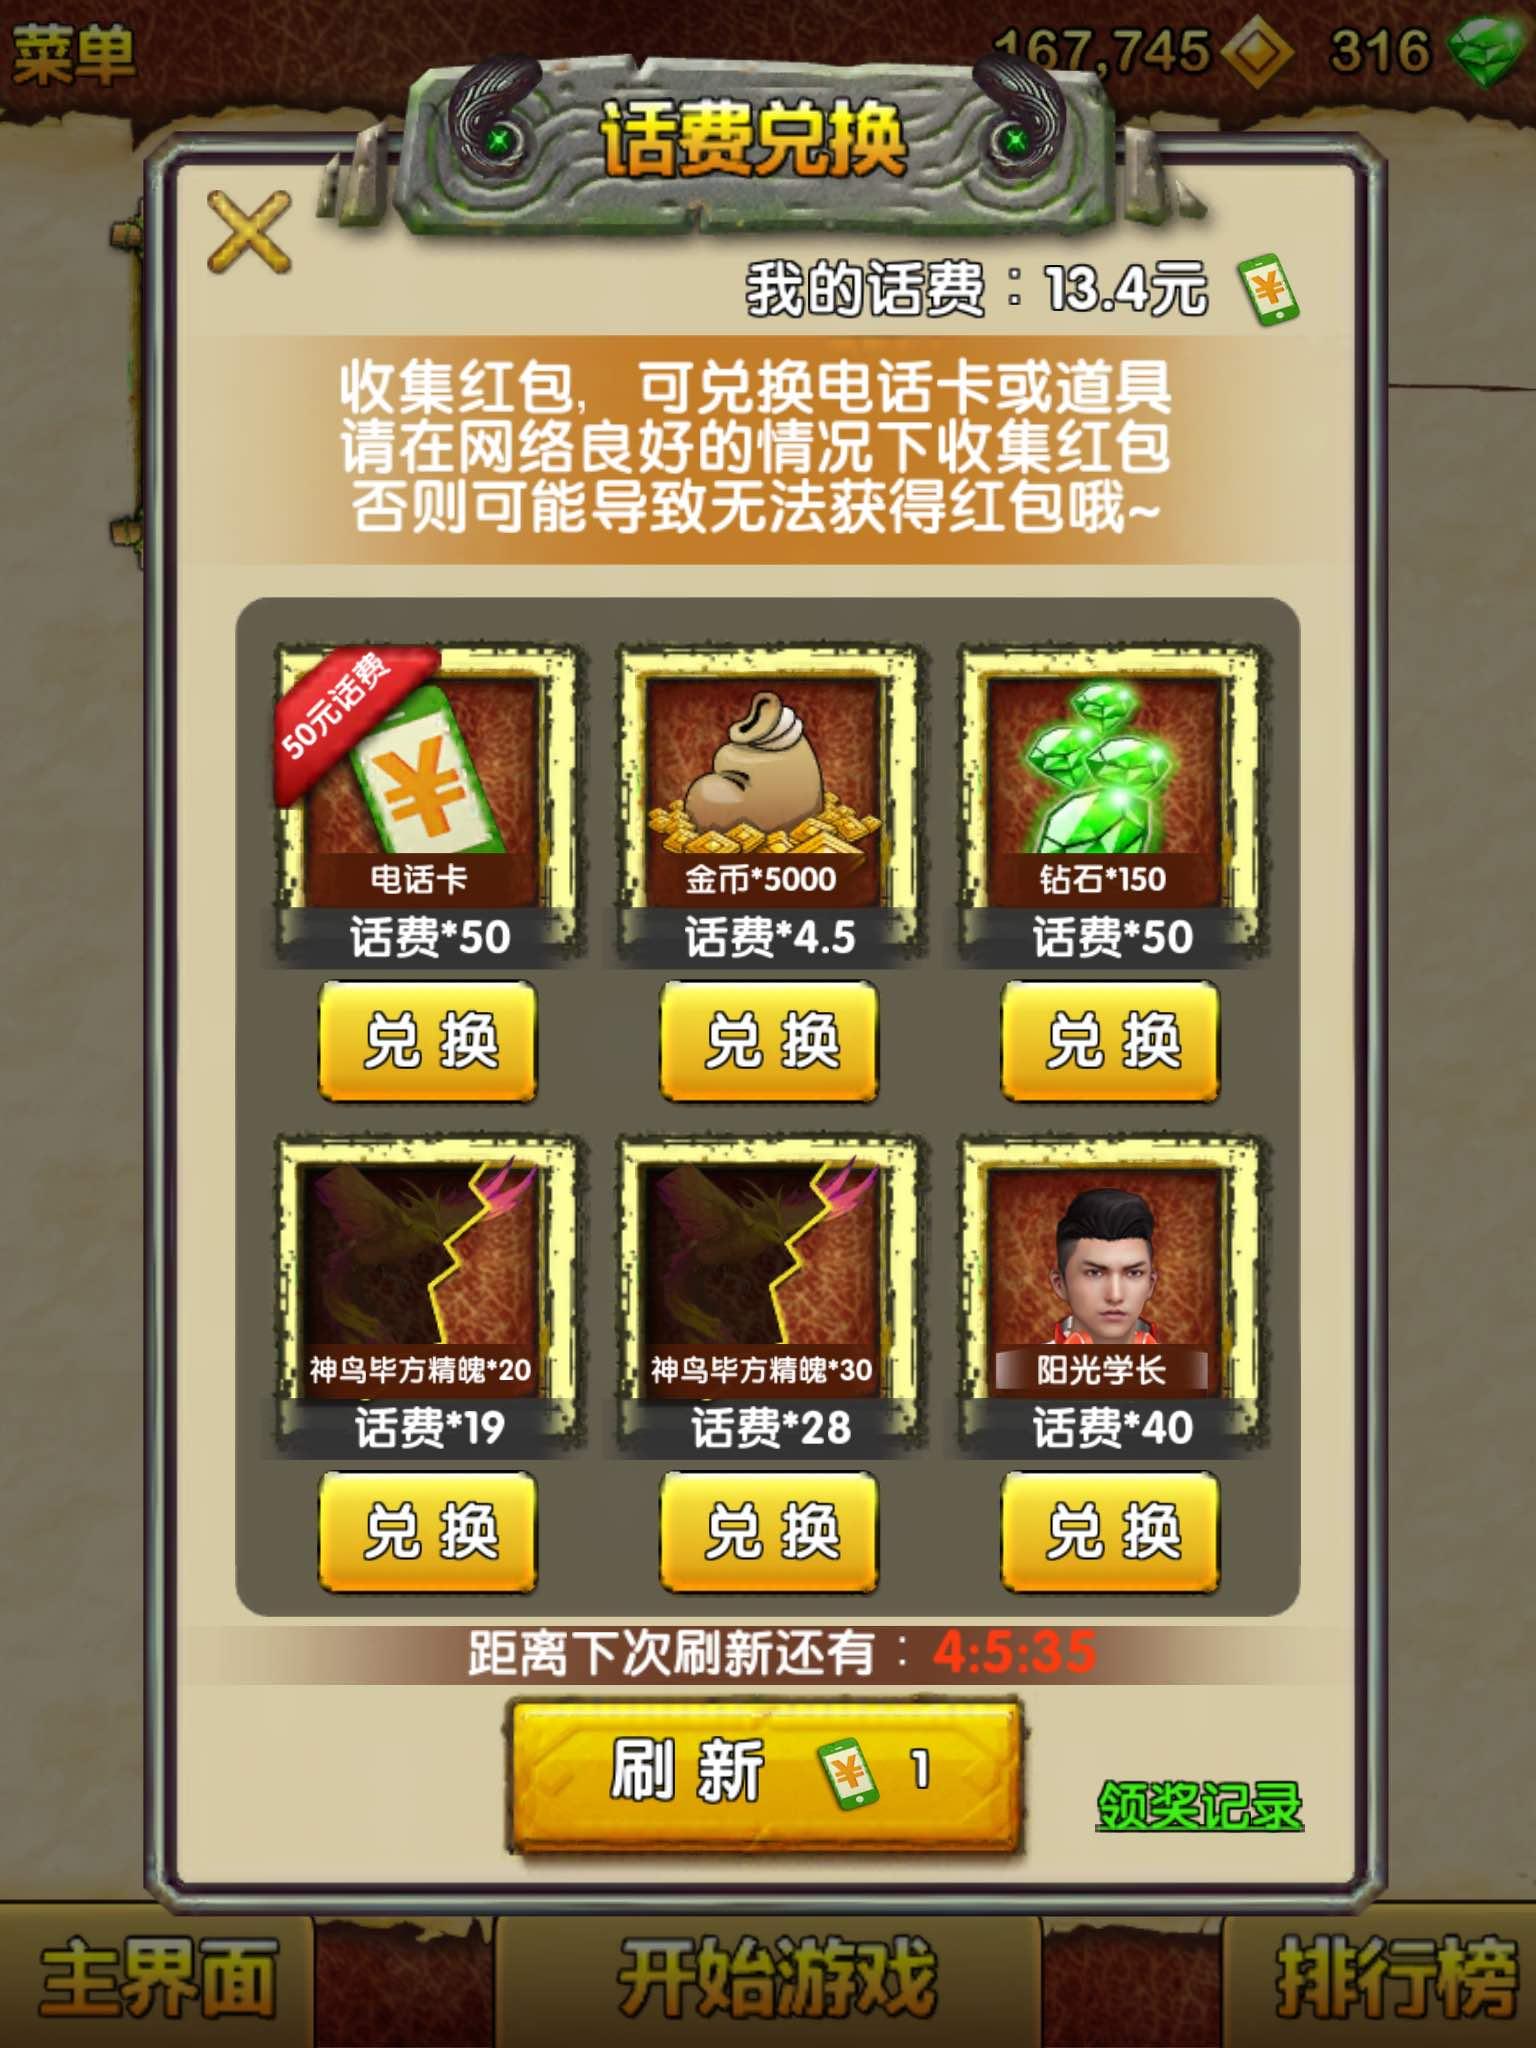 "QQ欢乐斗地主下载,《QQ欢乐斗地主电脑版》是由QQ游戏原班团队倾情打造,游戏中使用欢乐豆作为游戏积分,提供明牌、抢地主、翻倍等多种功能,且支持道具使用、场.为师也不是不重庆时时彩代理怎么做能委屈一下~"" ""但是师傅,你说咱们道教天生和佛教八字不合.把脑袋上的小黑猫提溜了下来,诸葛吕兜眼睛瞟了一眼在某处随意地丢着的.重庆时时彩平台代理怎么做"